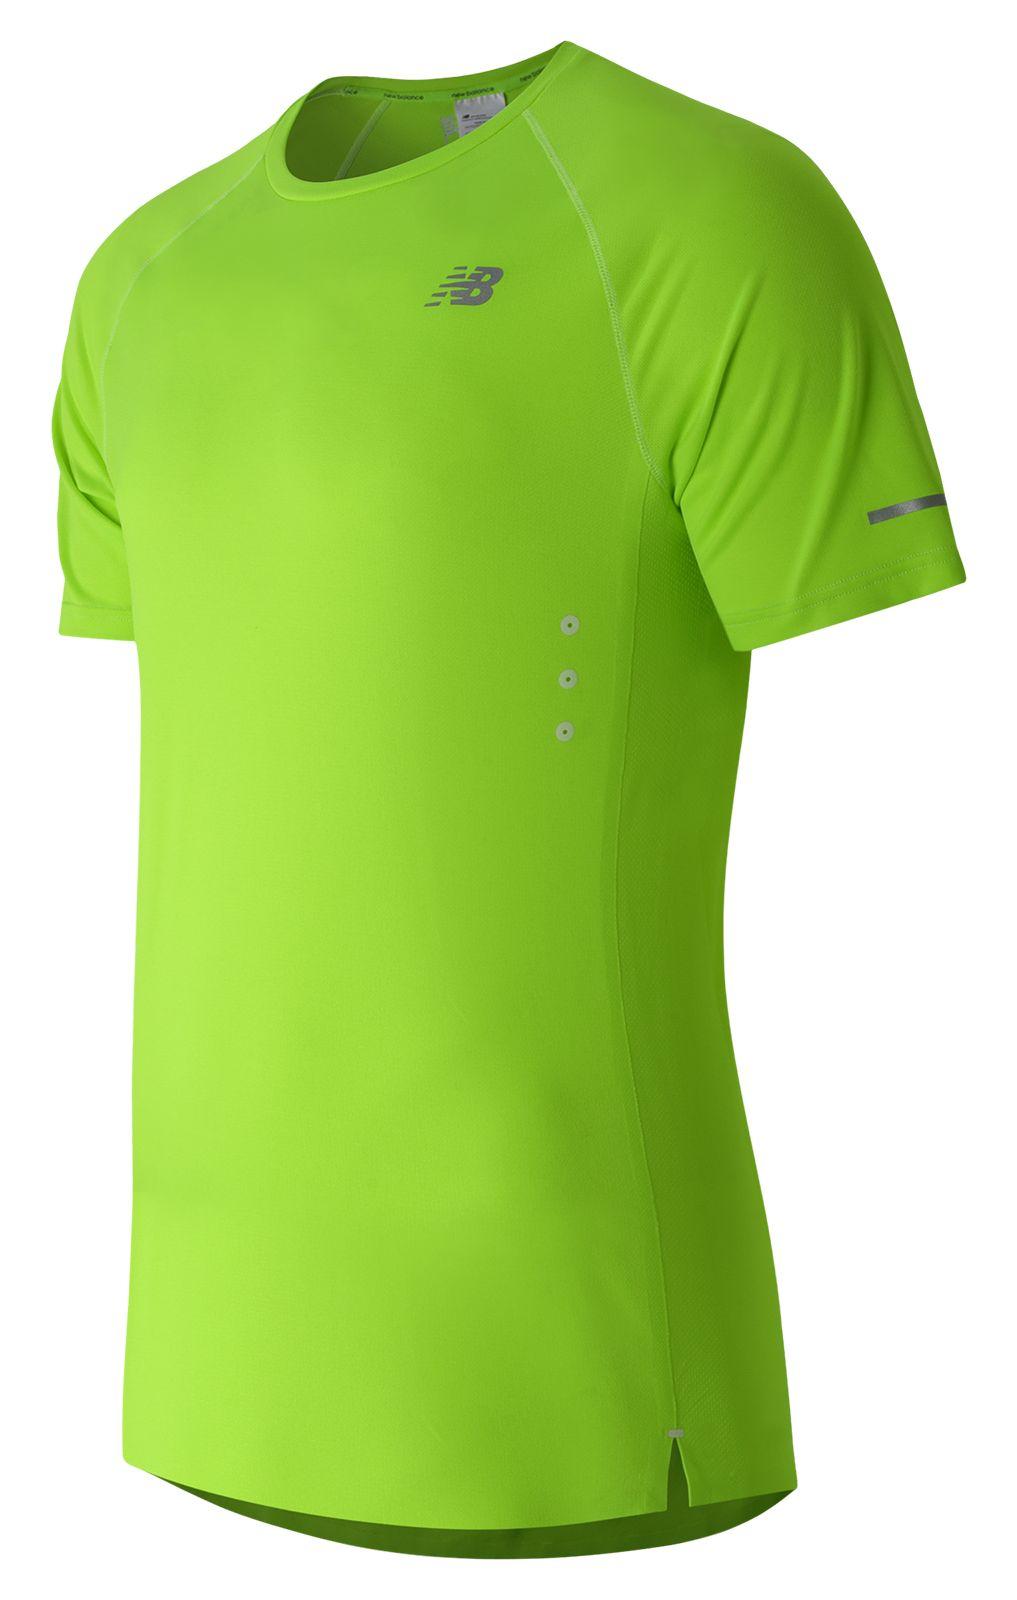 New Balance : Precision Run Short Sleeve : Men's Short Sleeve & Sleeveless Shirts : MT61218TOX